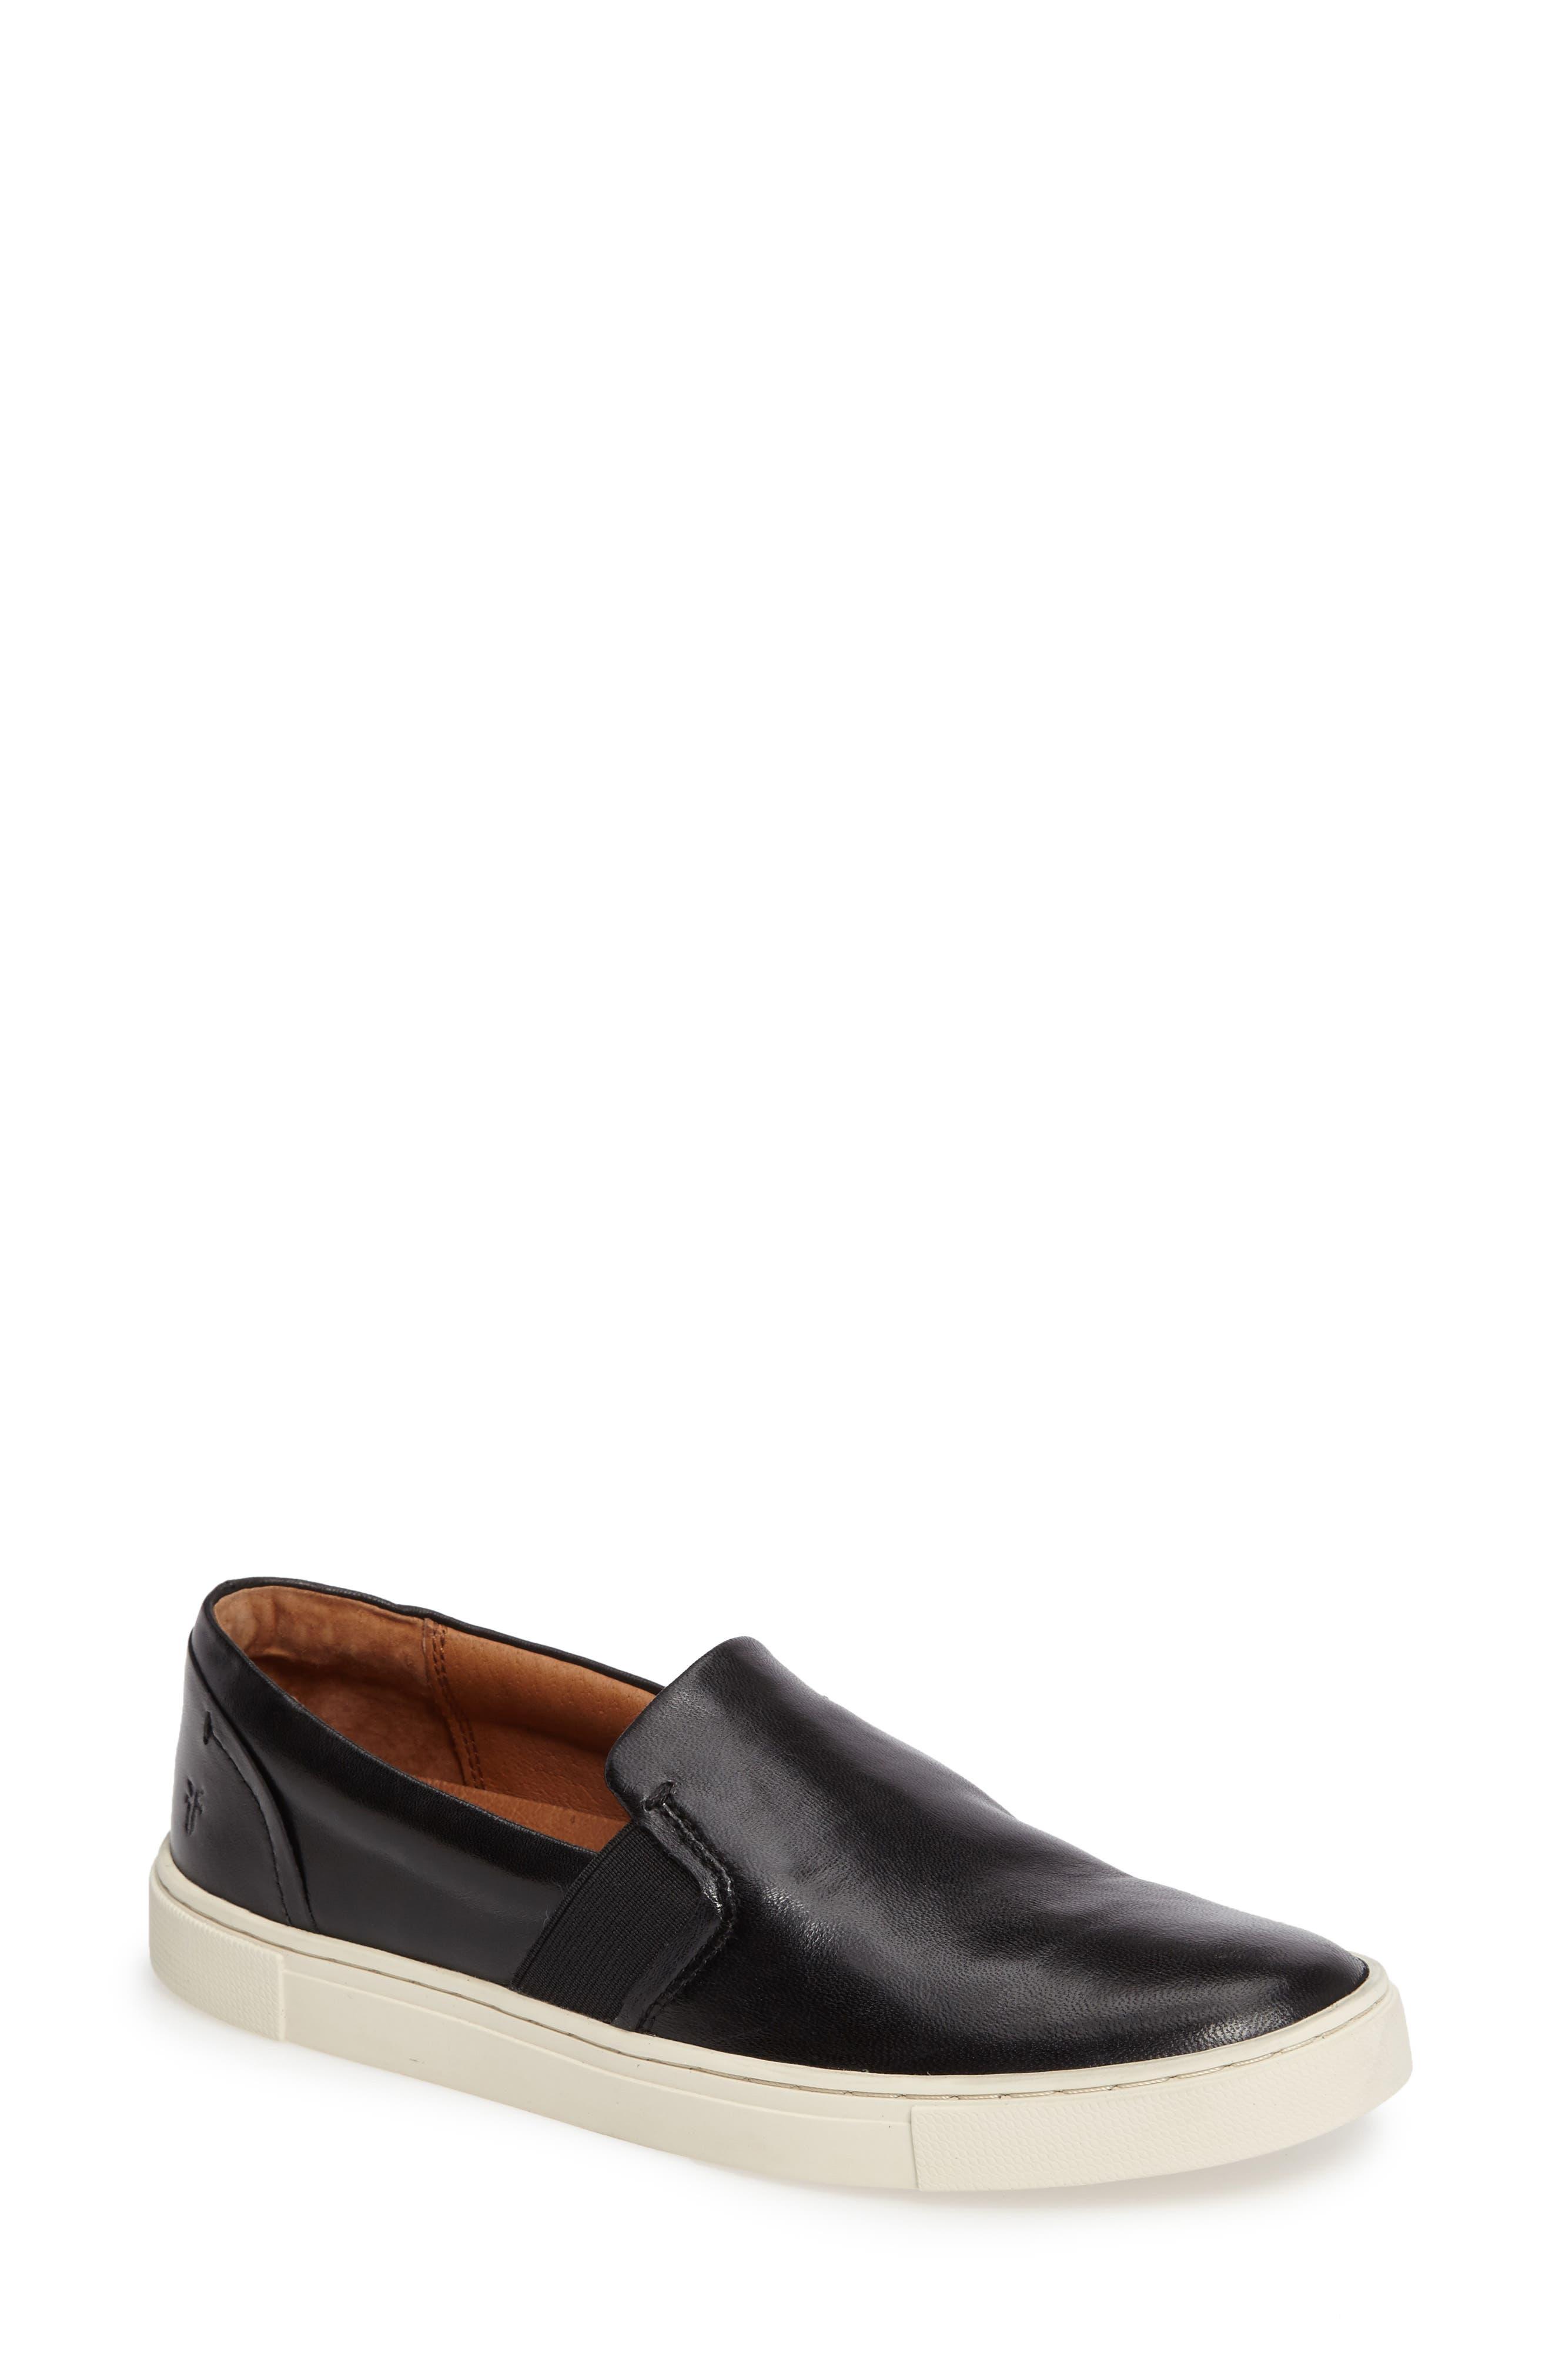 FRYE, Ivy Slip-On Sneaker, Main thumbnail 1, color, BLACK/ BLACK